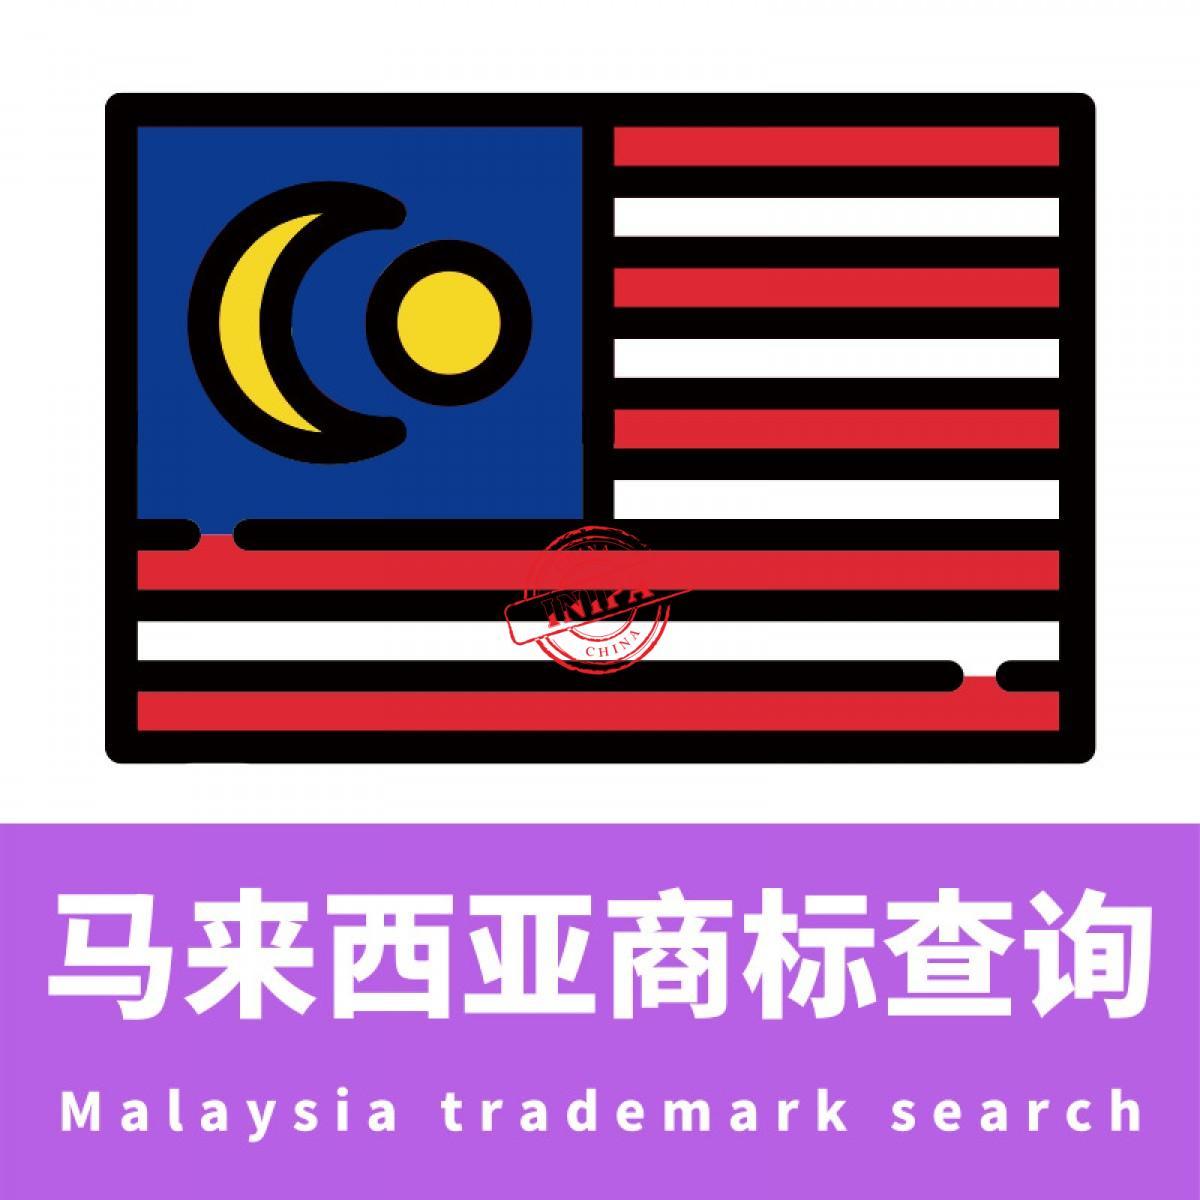 马来西亚商标查询/Malaysia trademark search